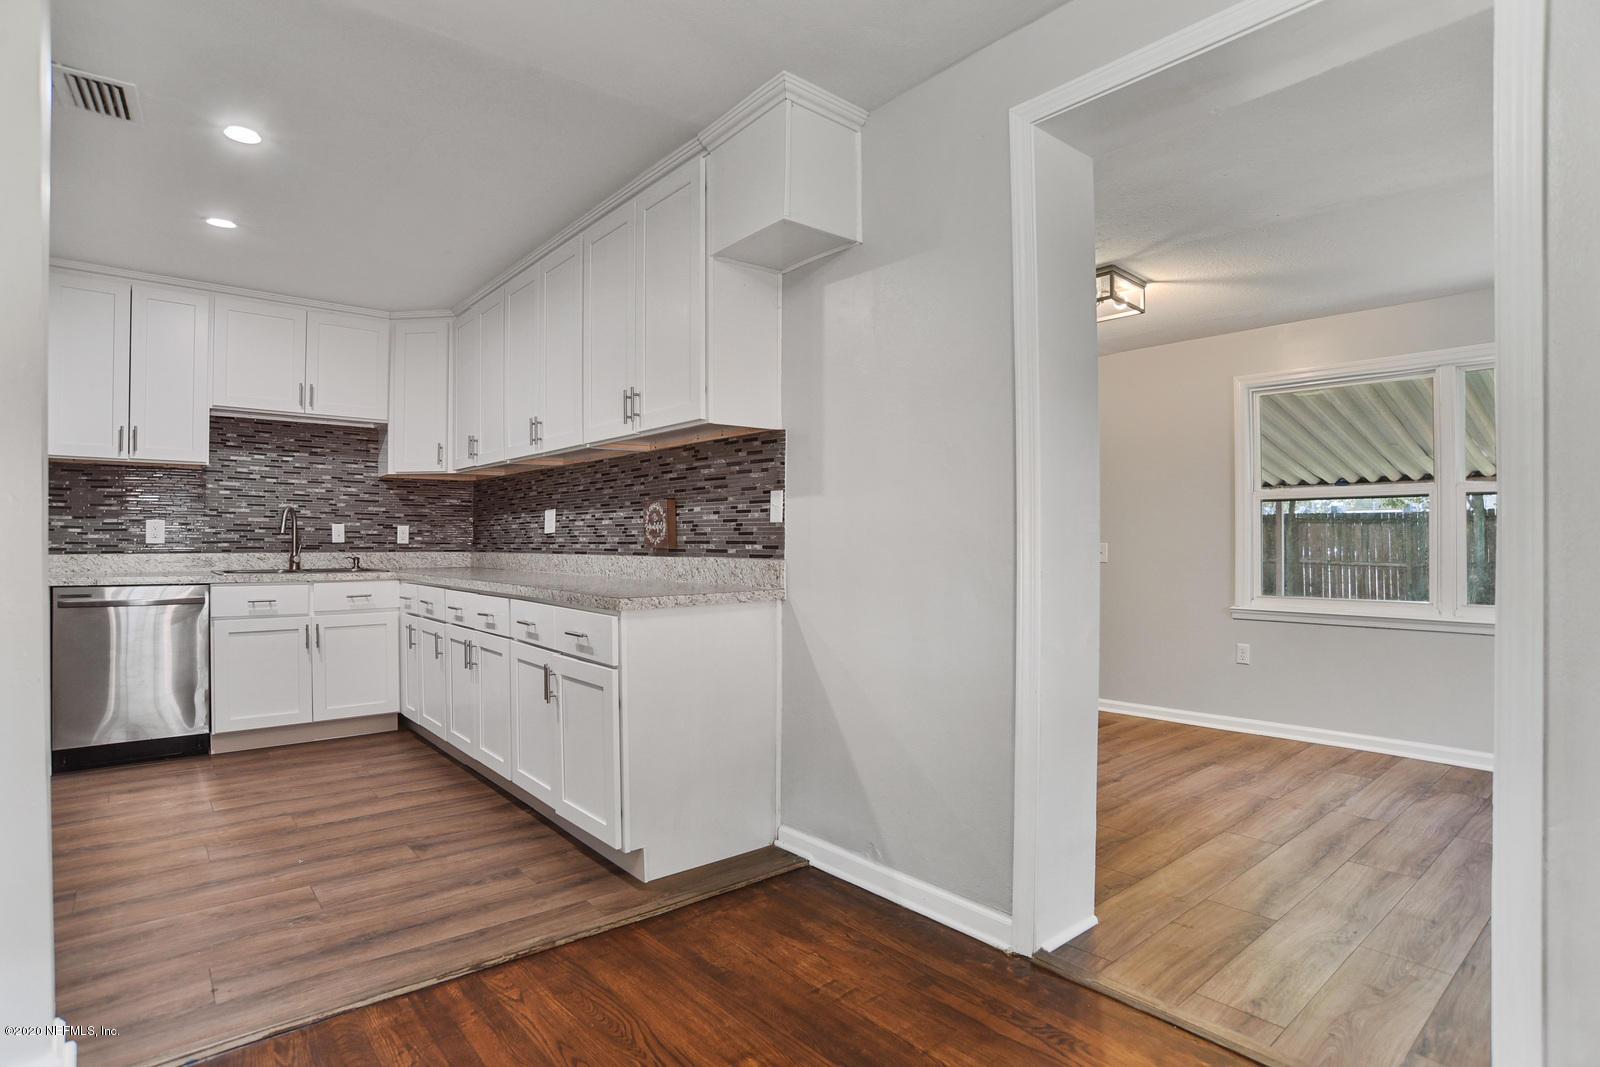 1738 SEFA, JACKSONVILLE, FLORIDA 32210, 3 Bedrooms Bedrooms, ,2 BathroomsBathrooms,Residential,For sale,SEFA,1081627